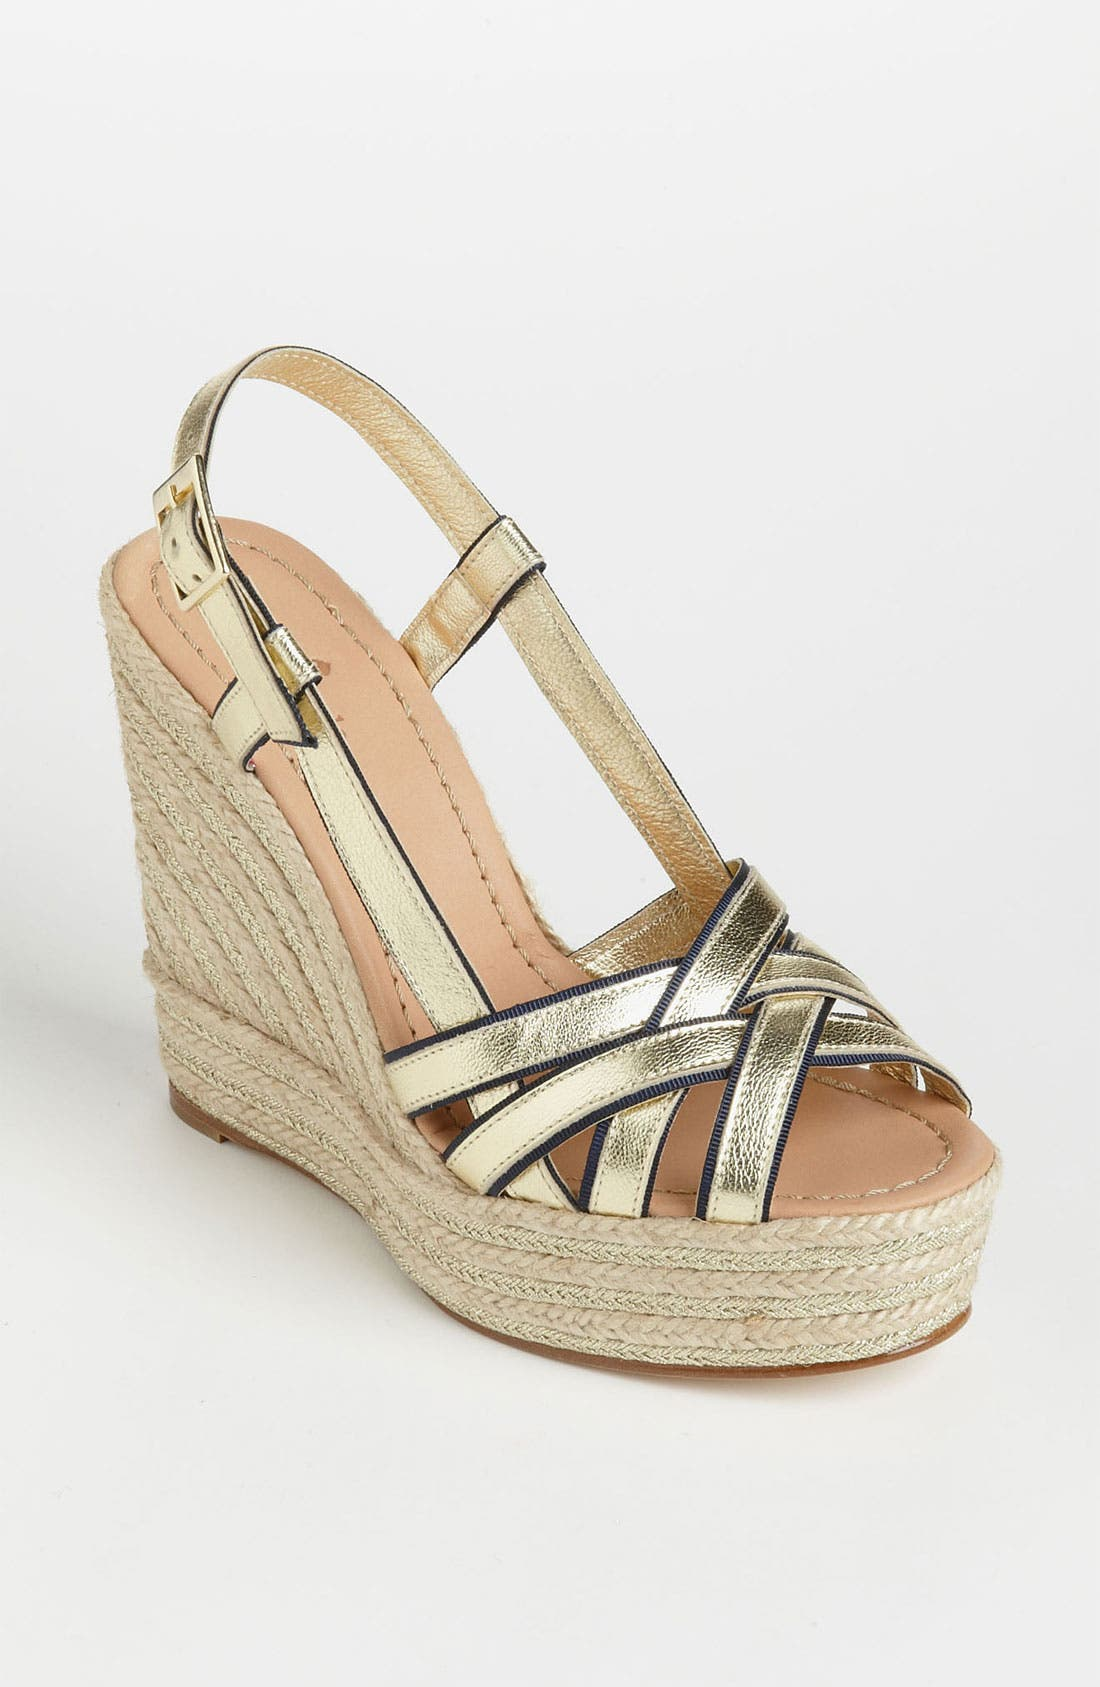 Main Image - kate spade new york 'ladan' wedge sandal